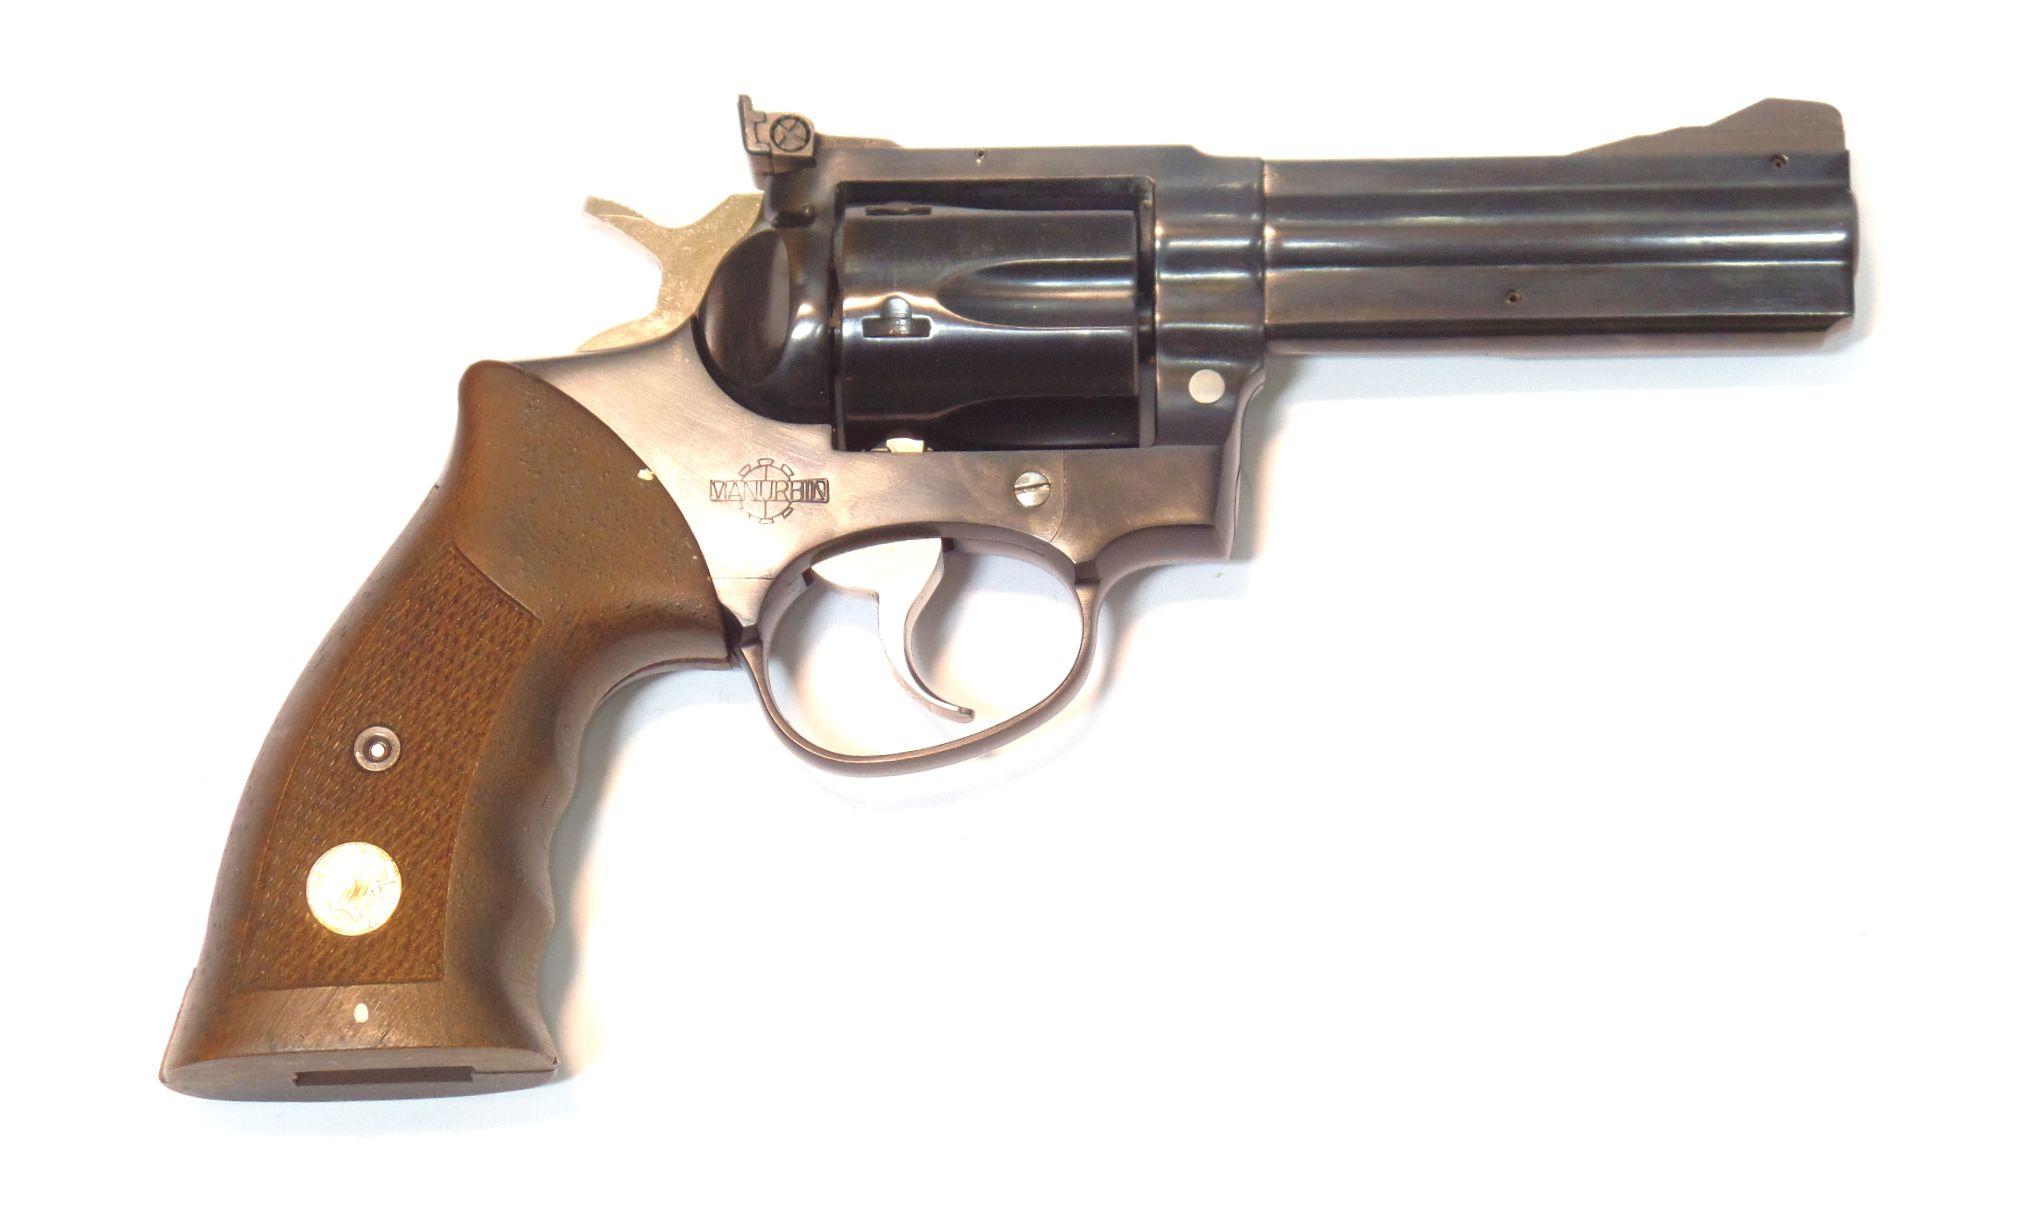 MANURHIN MR88S calibre 22LR